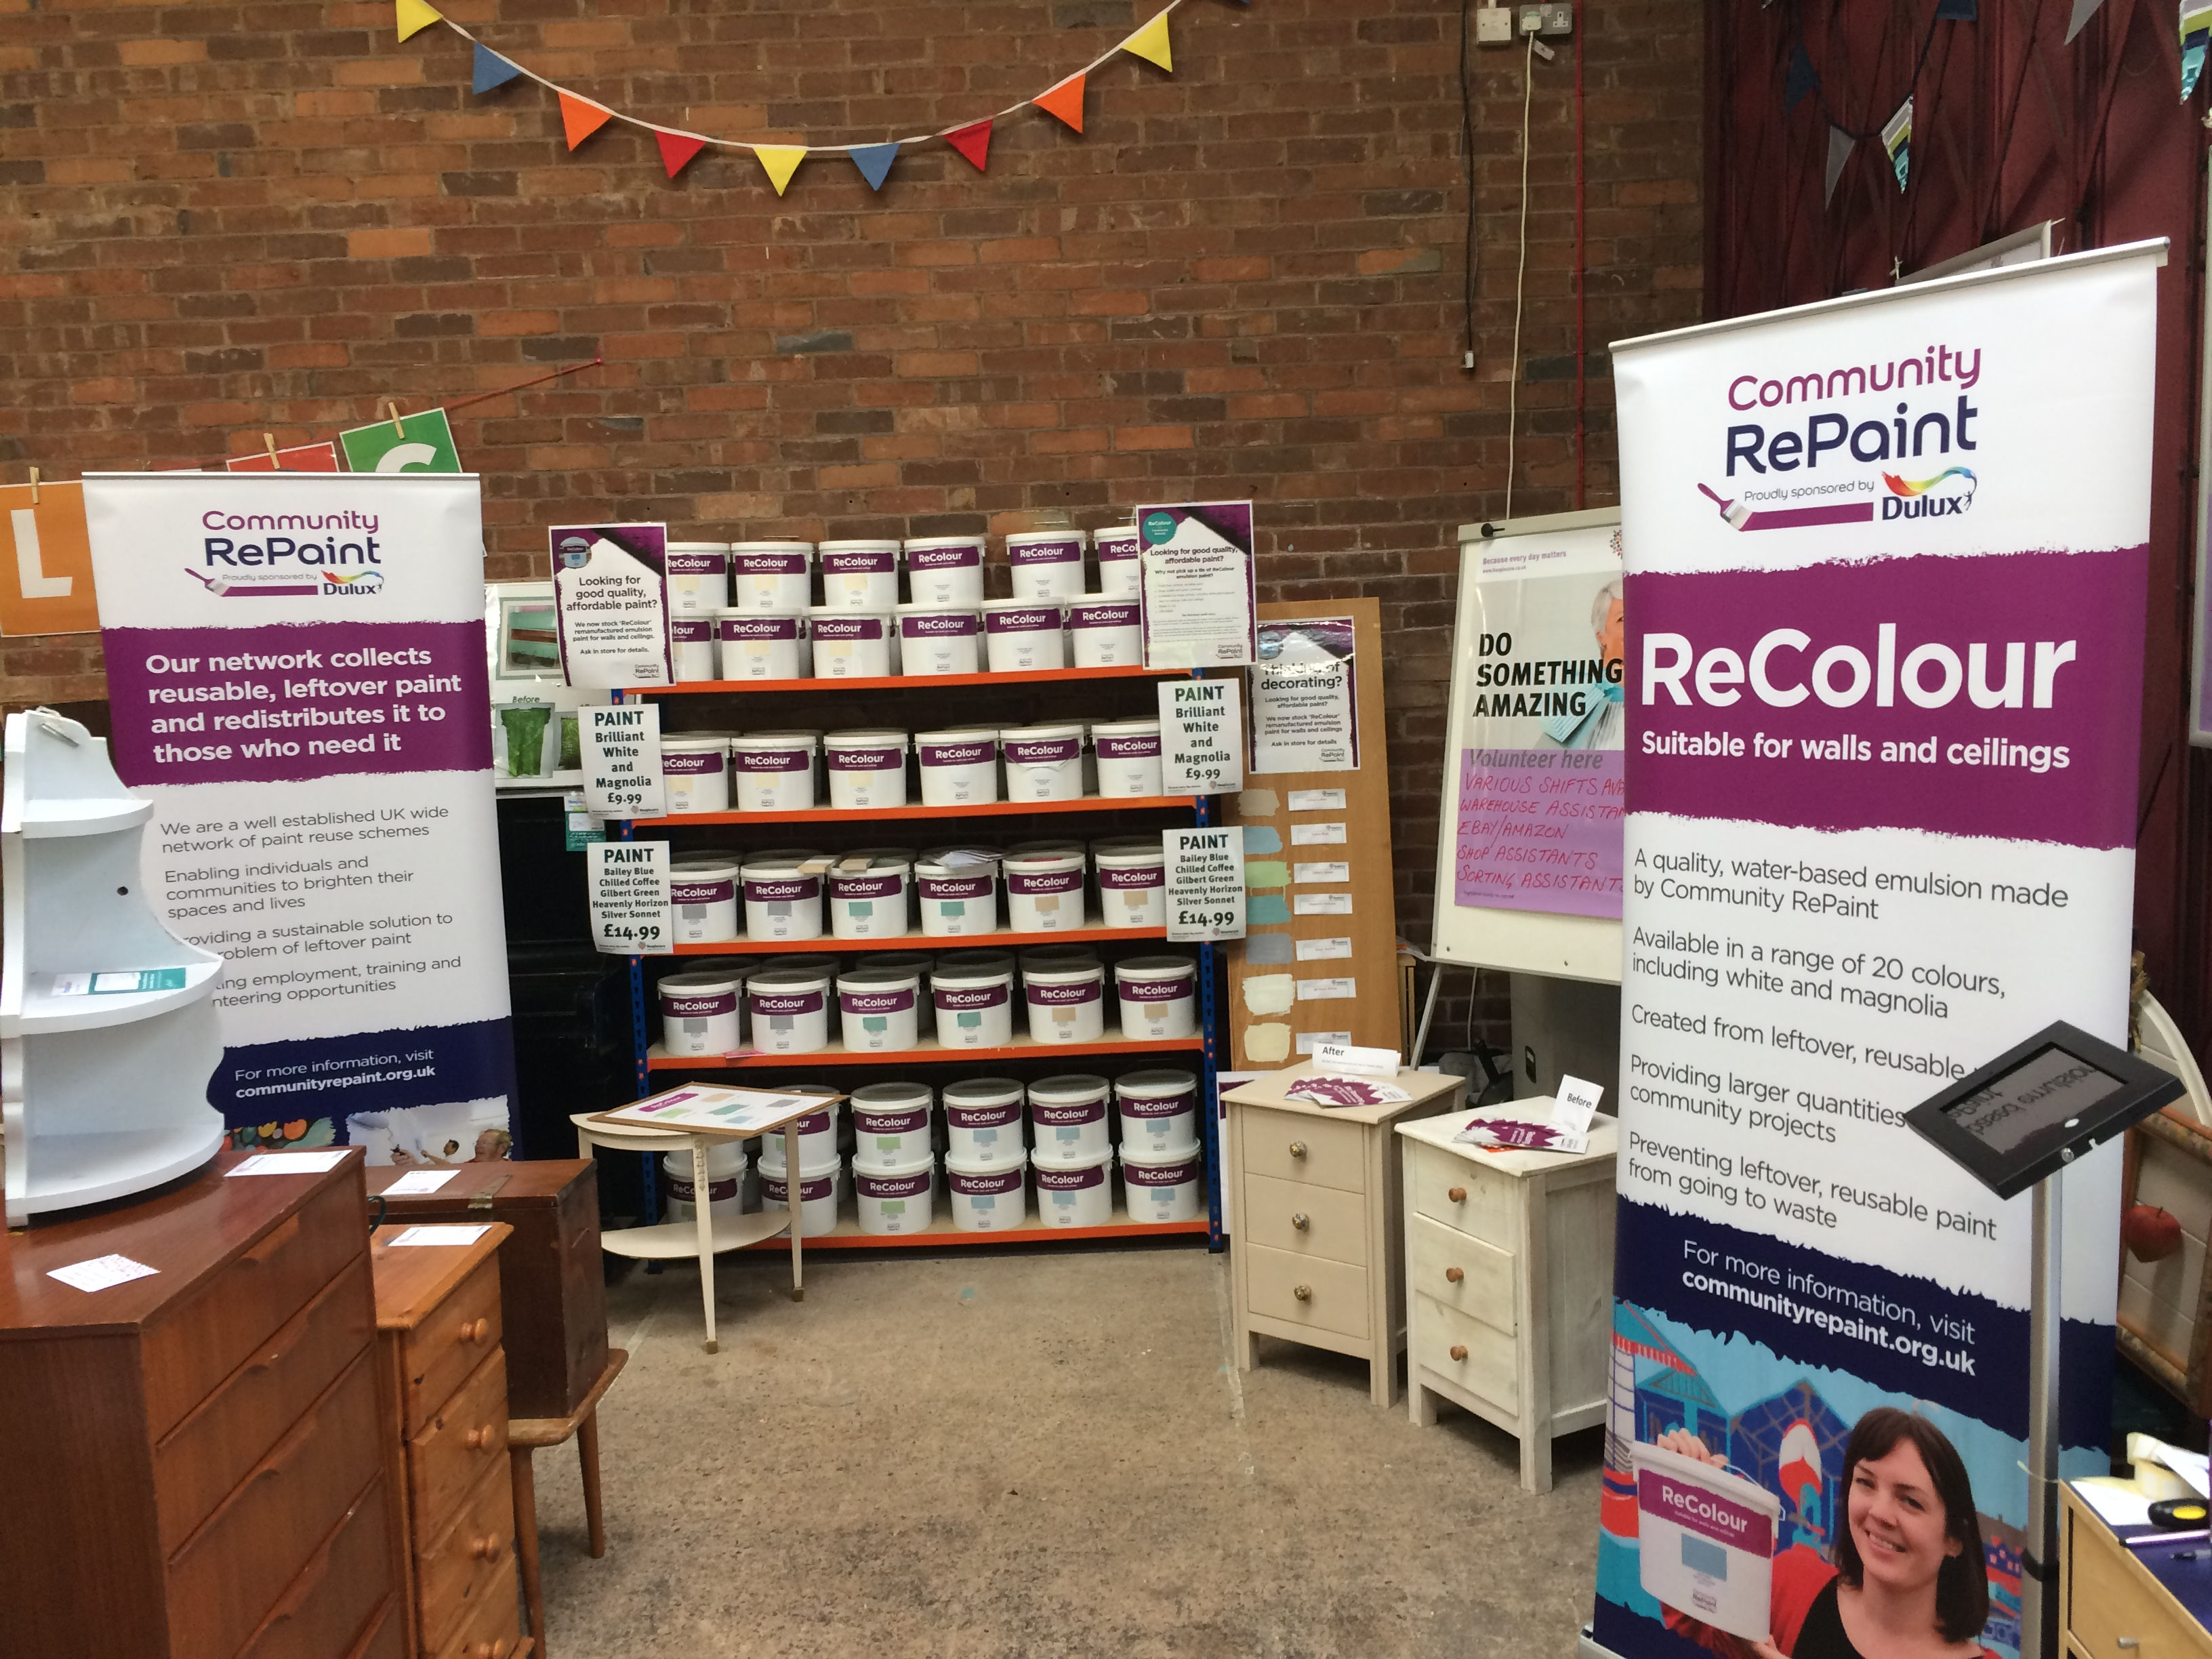 ReColour stocked shelves at Hospiscare Exeter.